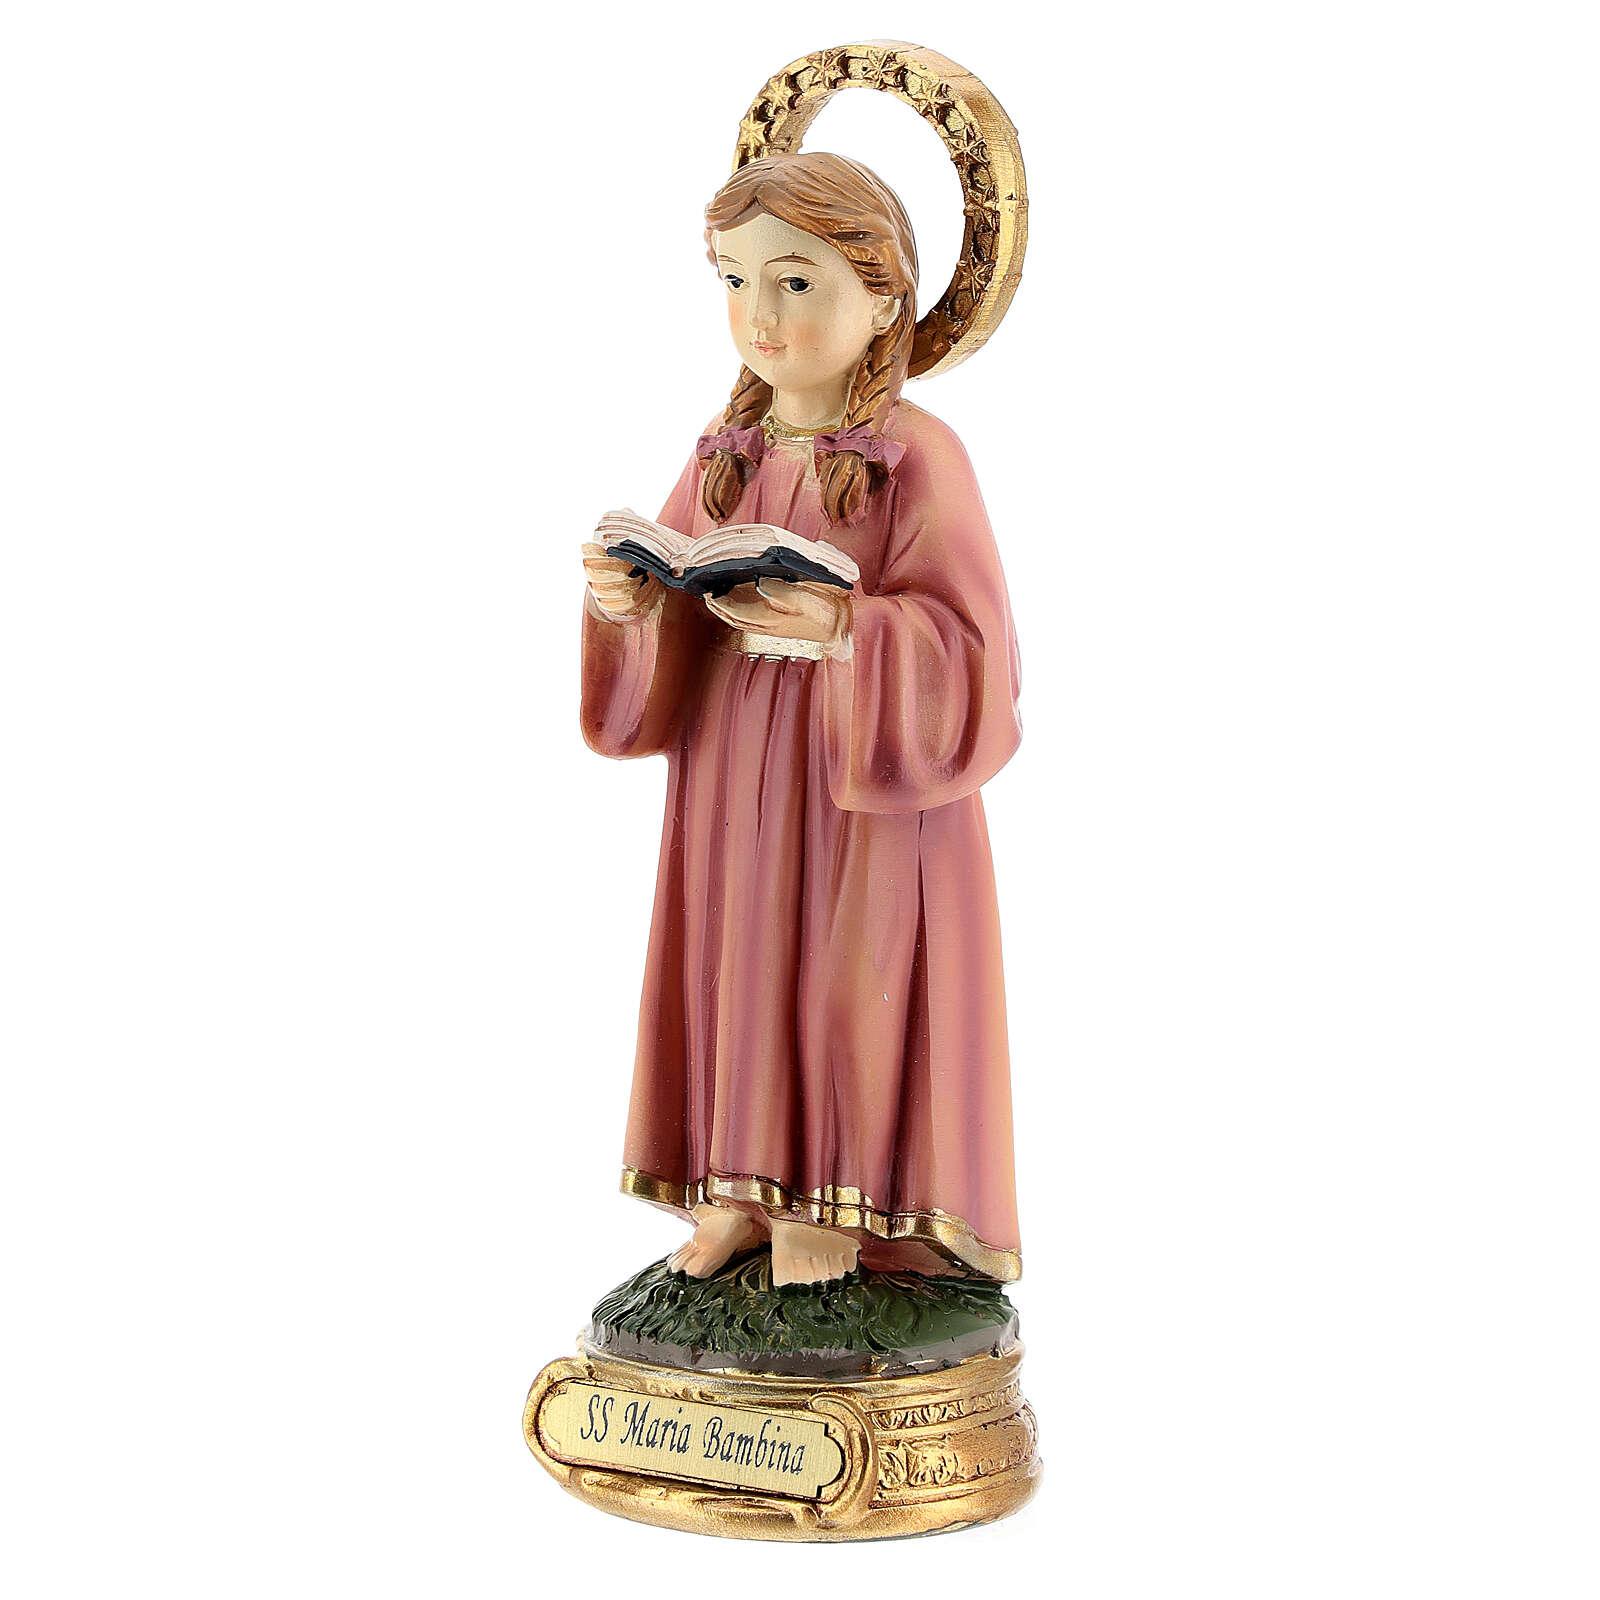 Santissima Maria bambina studio scritture statua resina 12,5 cm 4